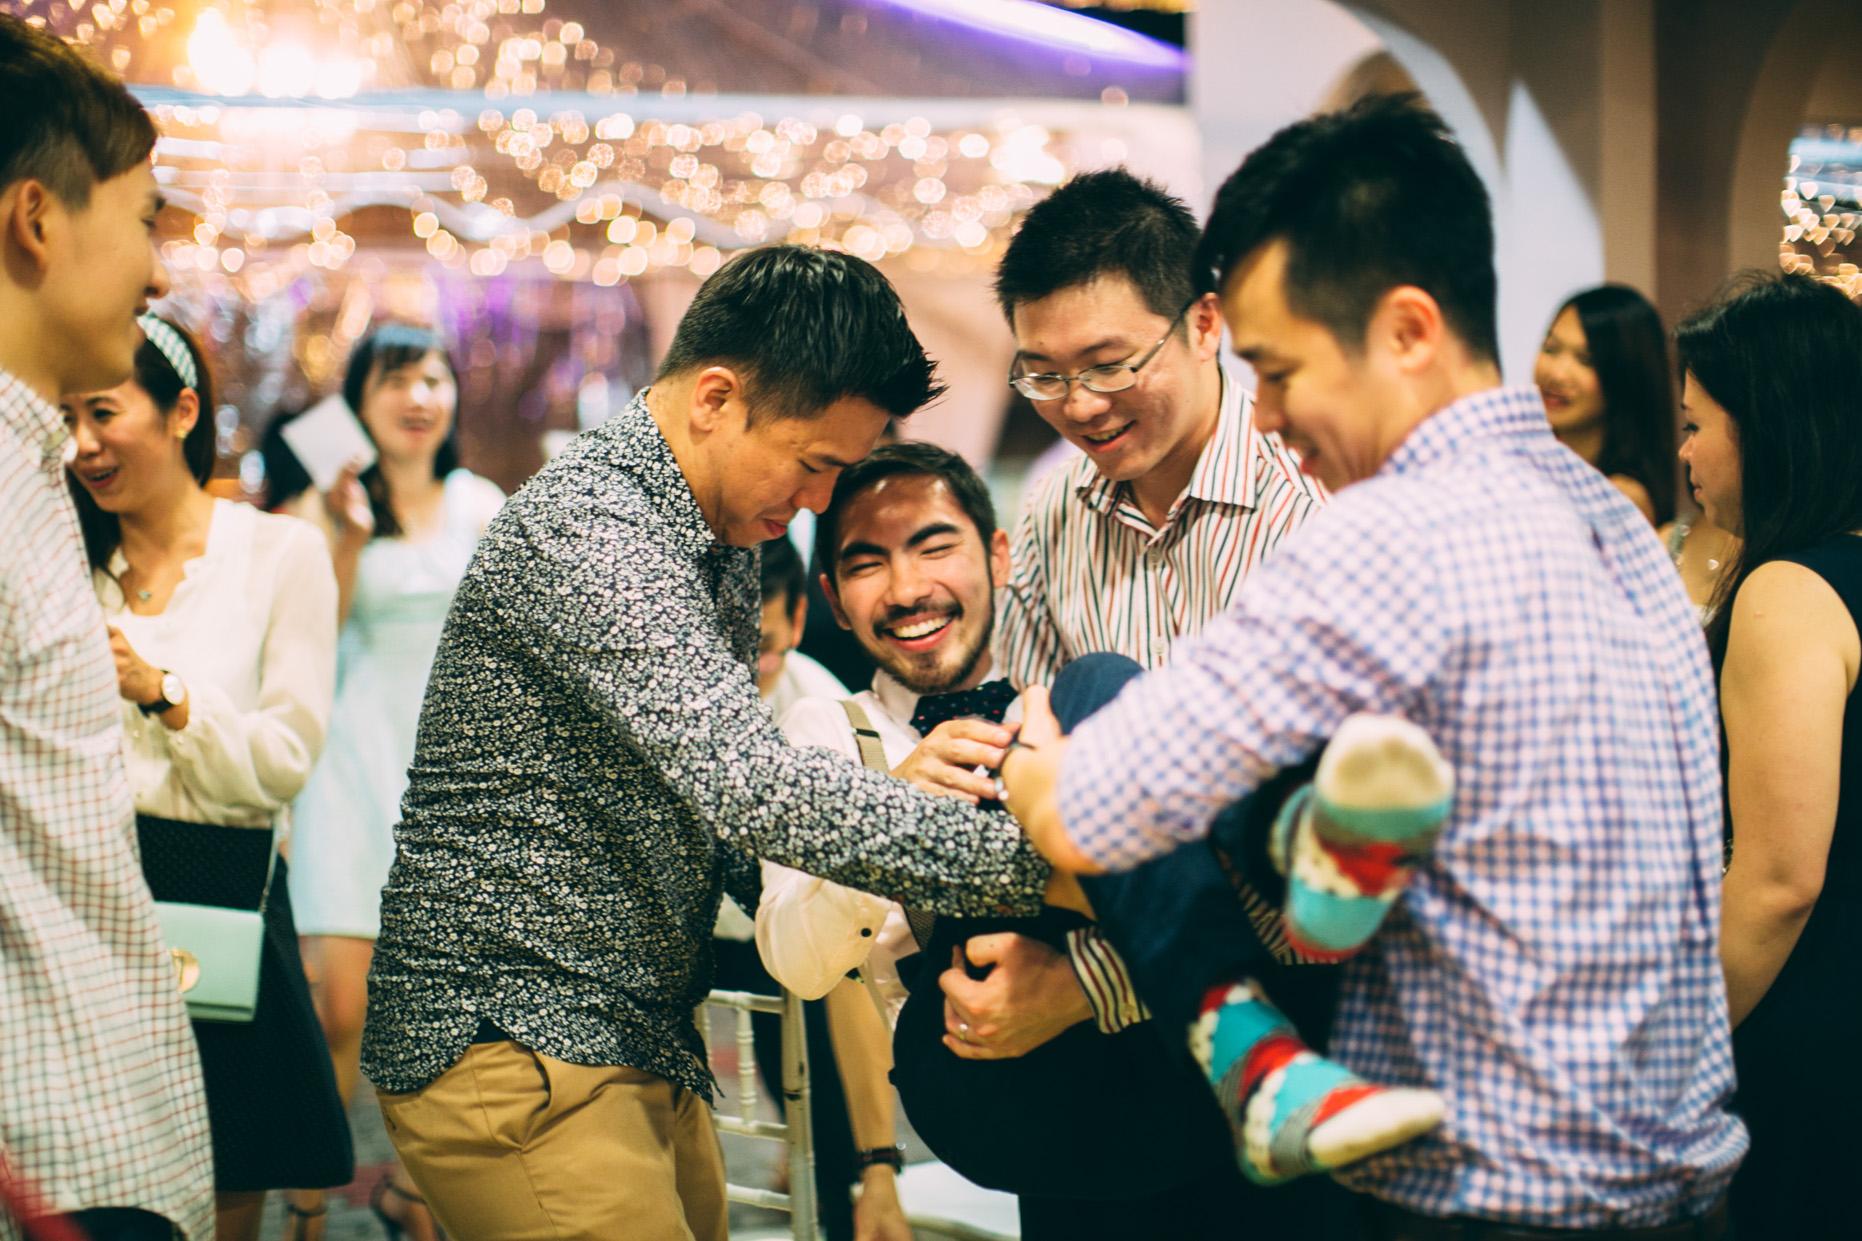 108-hellojanelee-sam grace-malaysia-wedding-day